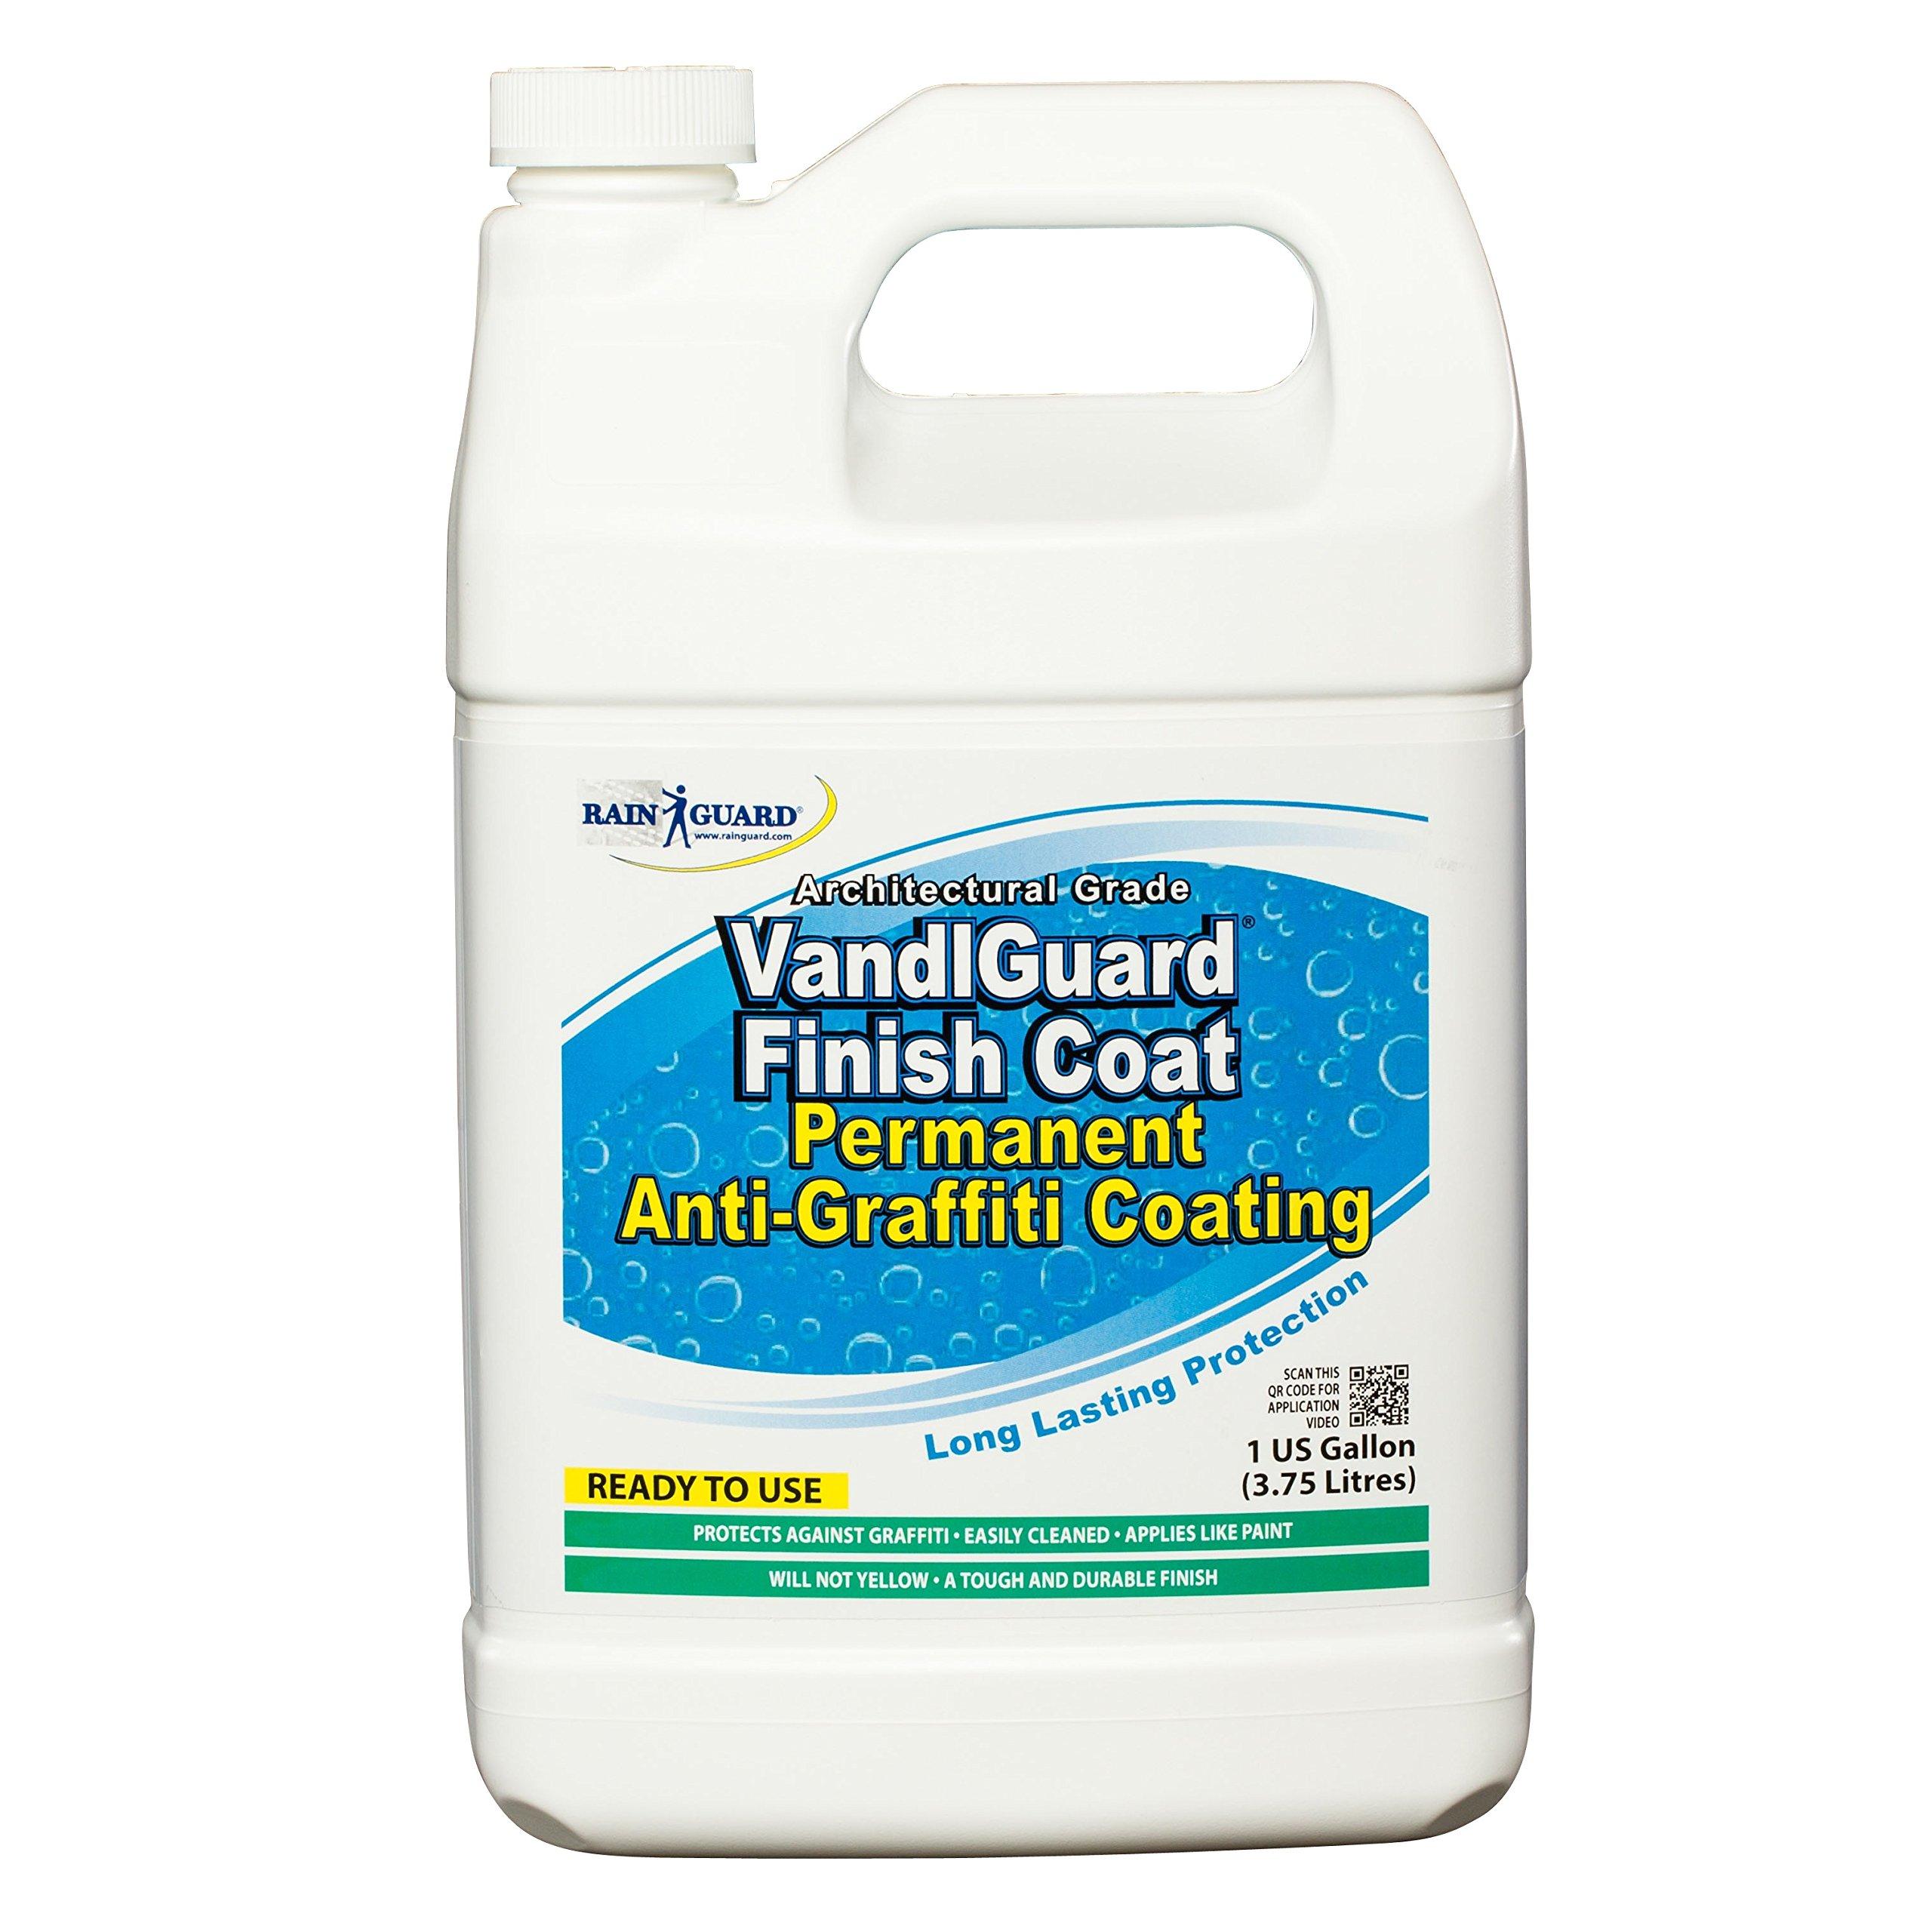 Rainguard International VG-7009 Vandlguard Finish Coat Anti-Graffiti Coating Ready to Use 1 gal, Clear, Pail